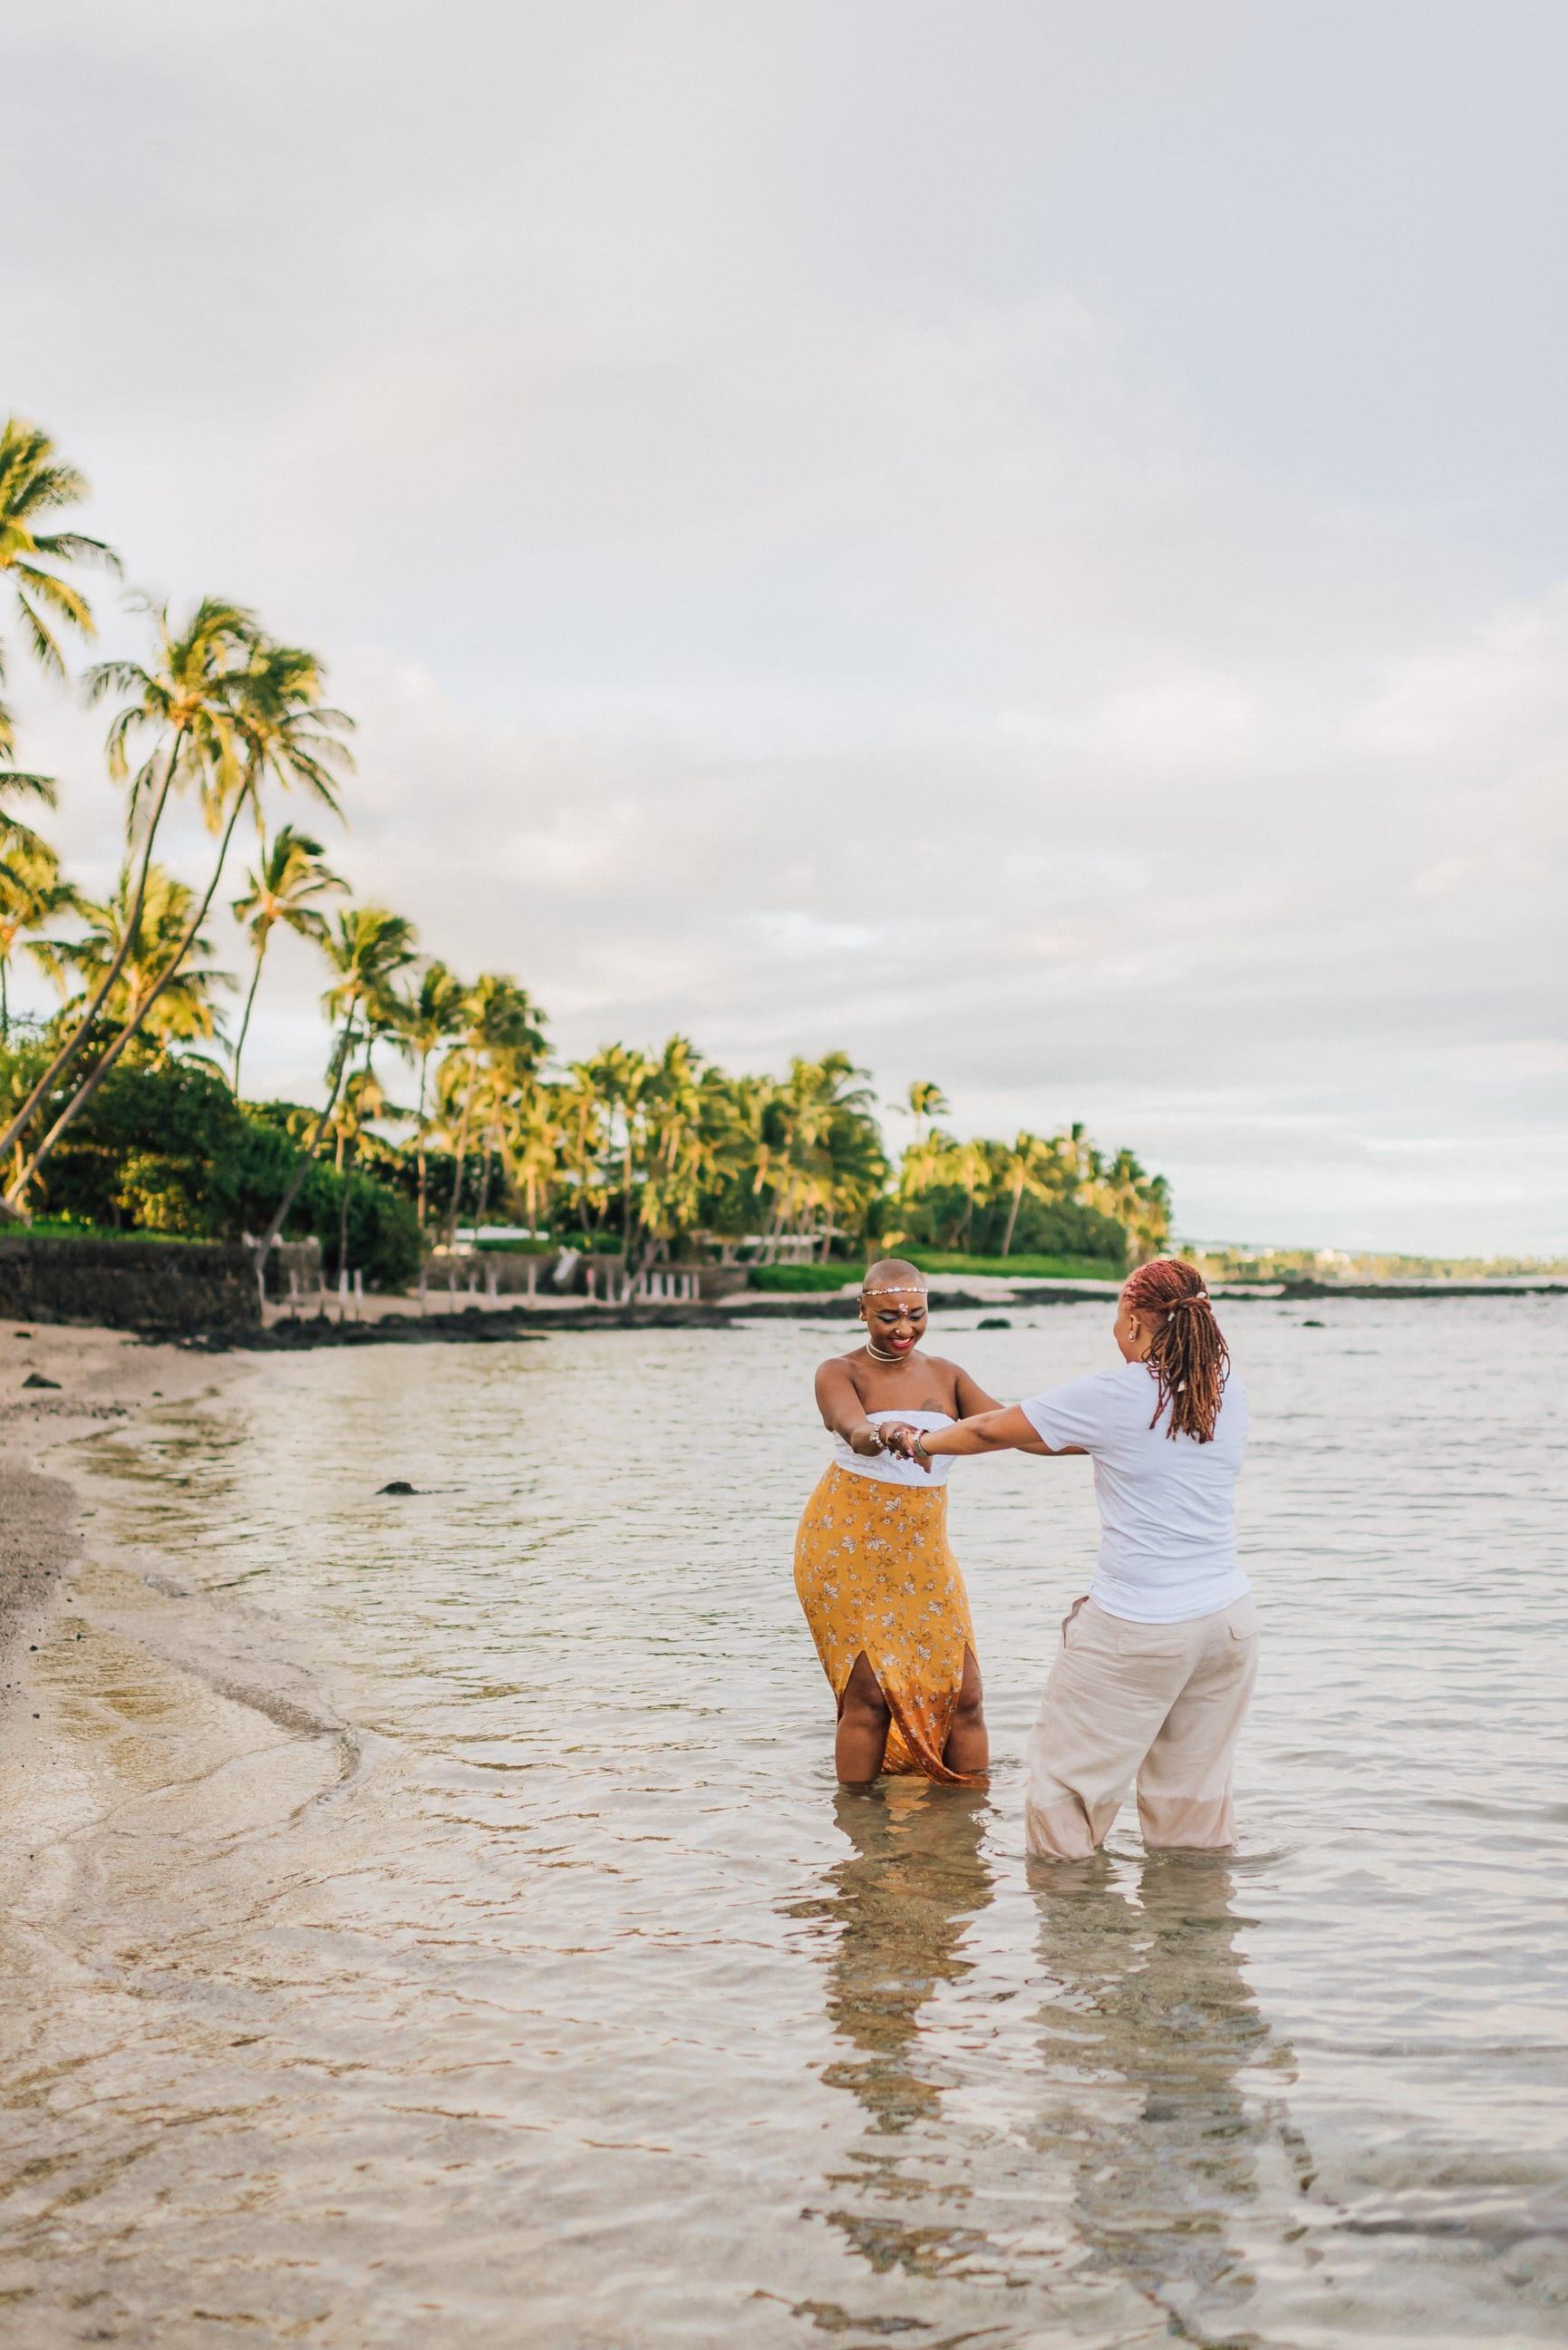 Big-Island-Photographer-Sunrise-16.jpg